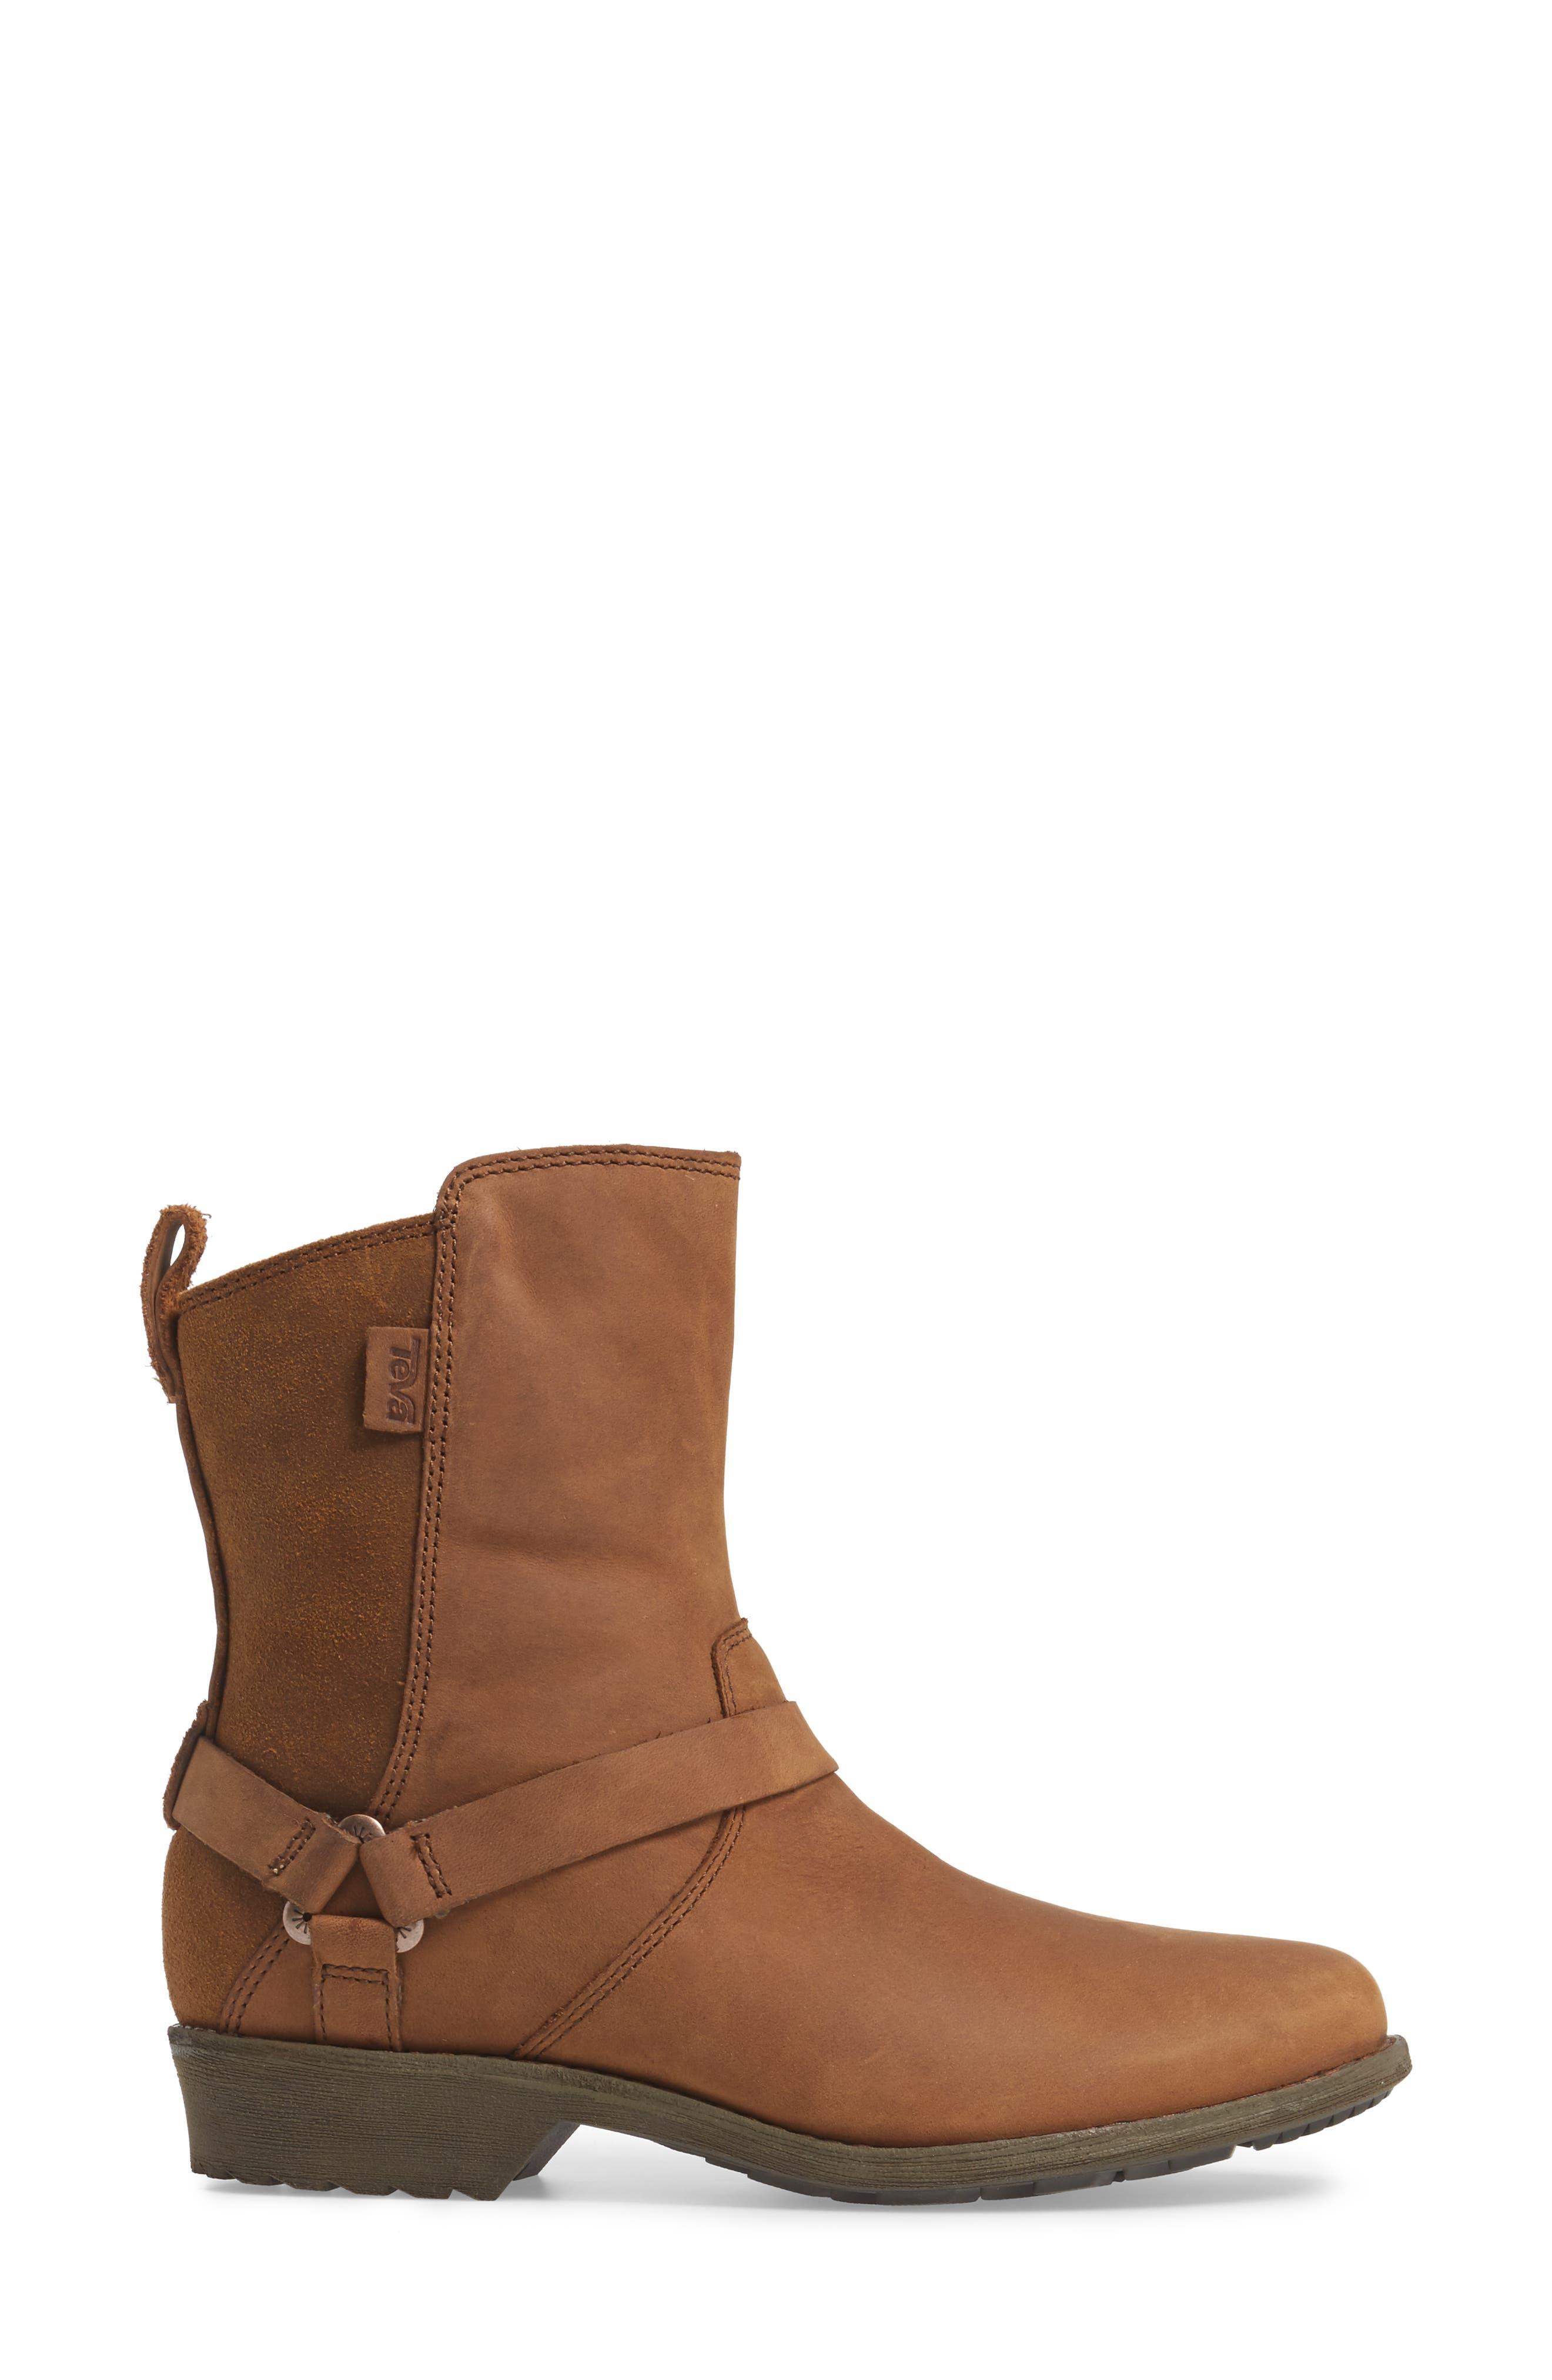 Dina La Vina Dos Waterproof Boot,                             Alternate thumbnail 3, color,                             Bison Leather